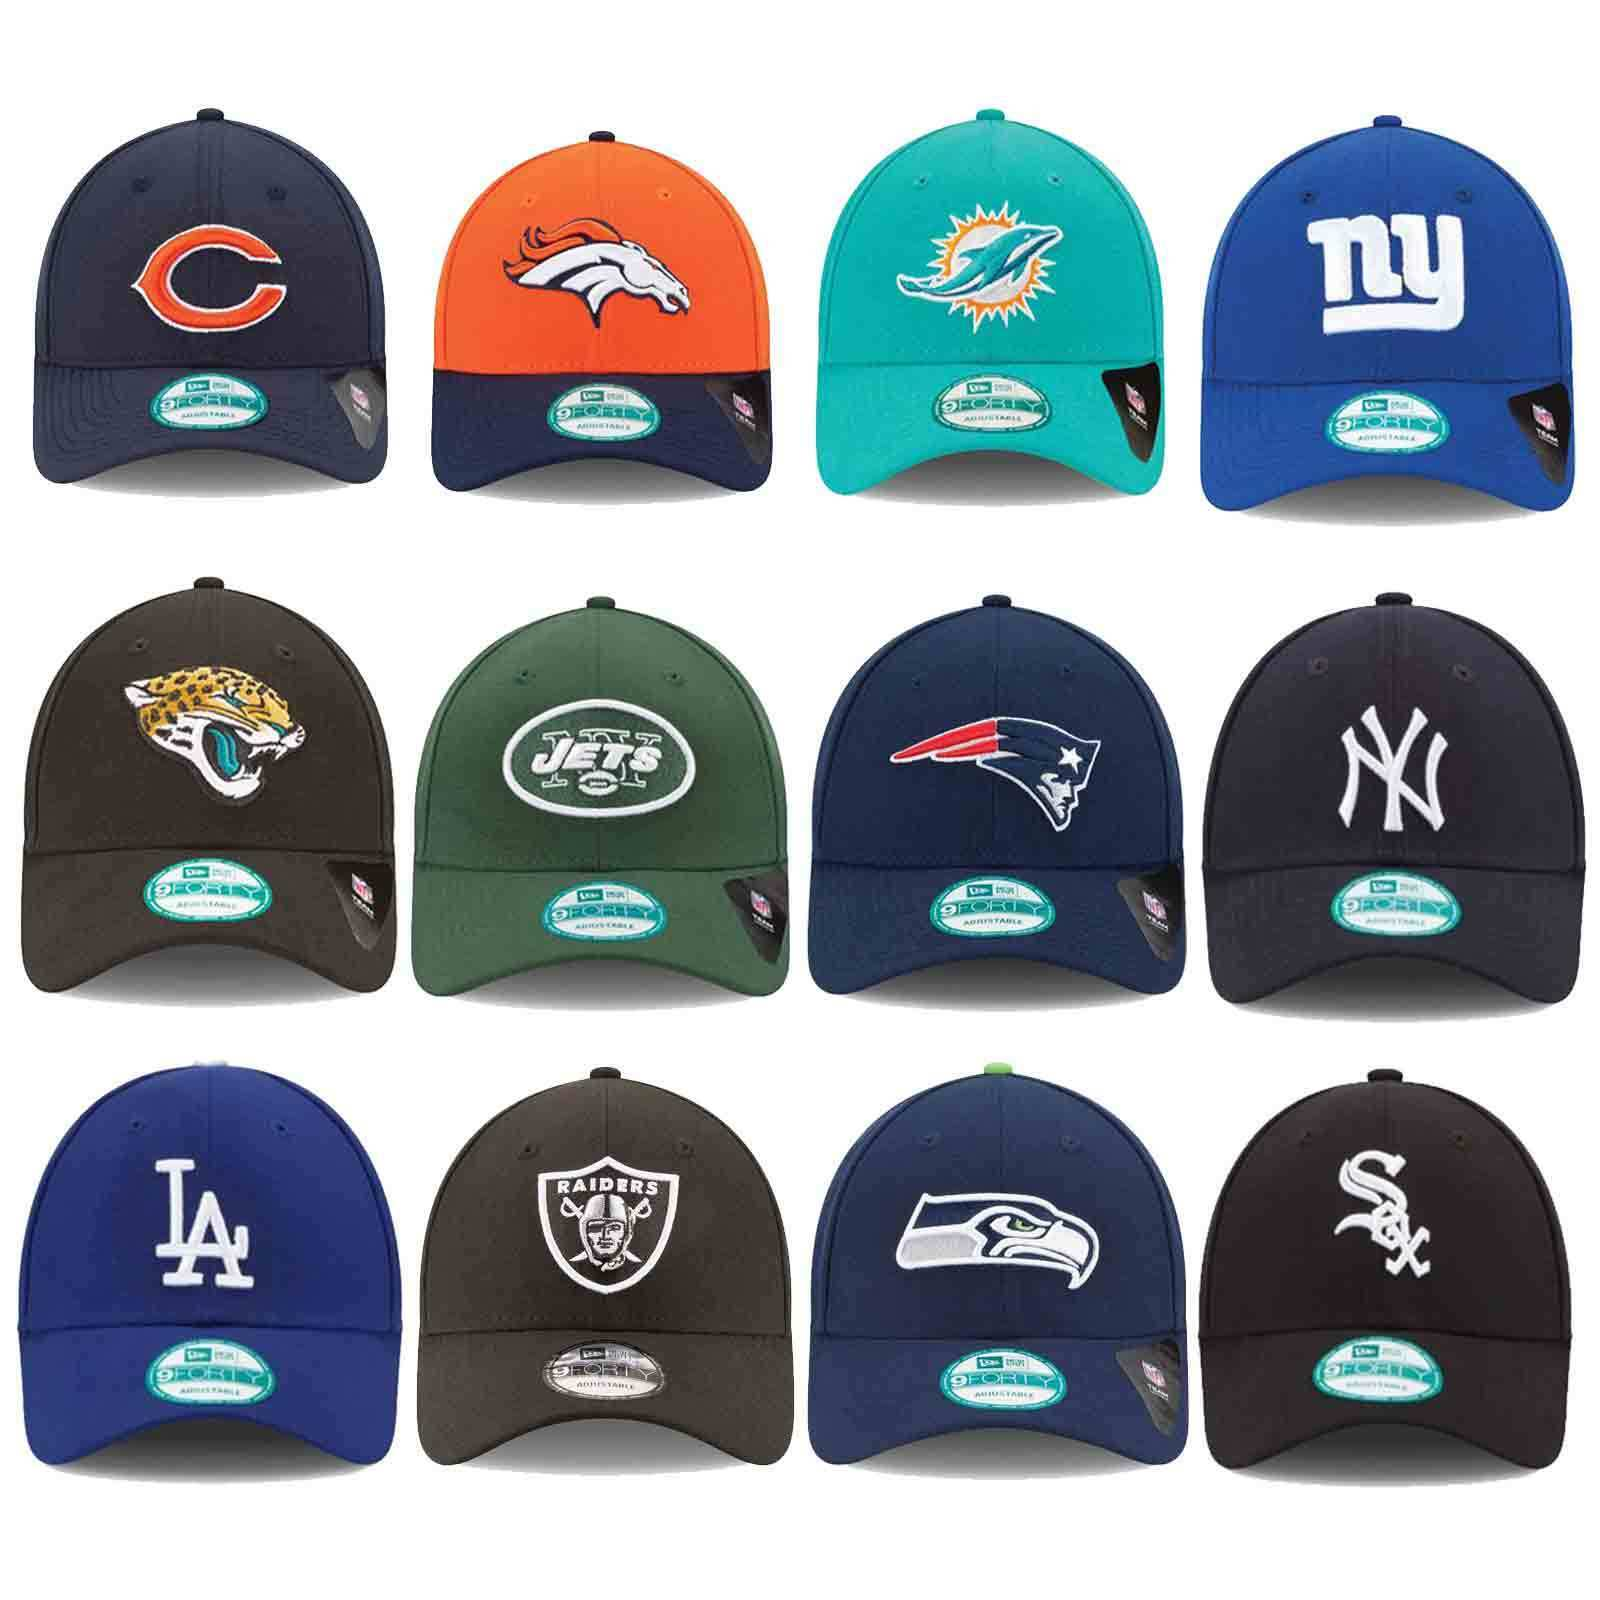 New Era NFL MLB NBA 'The League' Fashion Baseball 940™ Adjustable Cap Men's